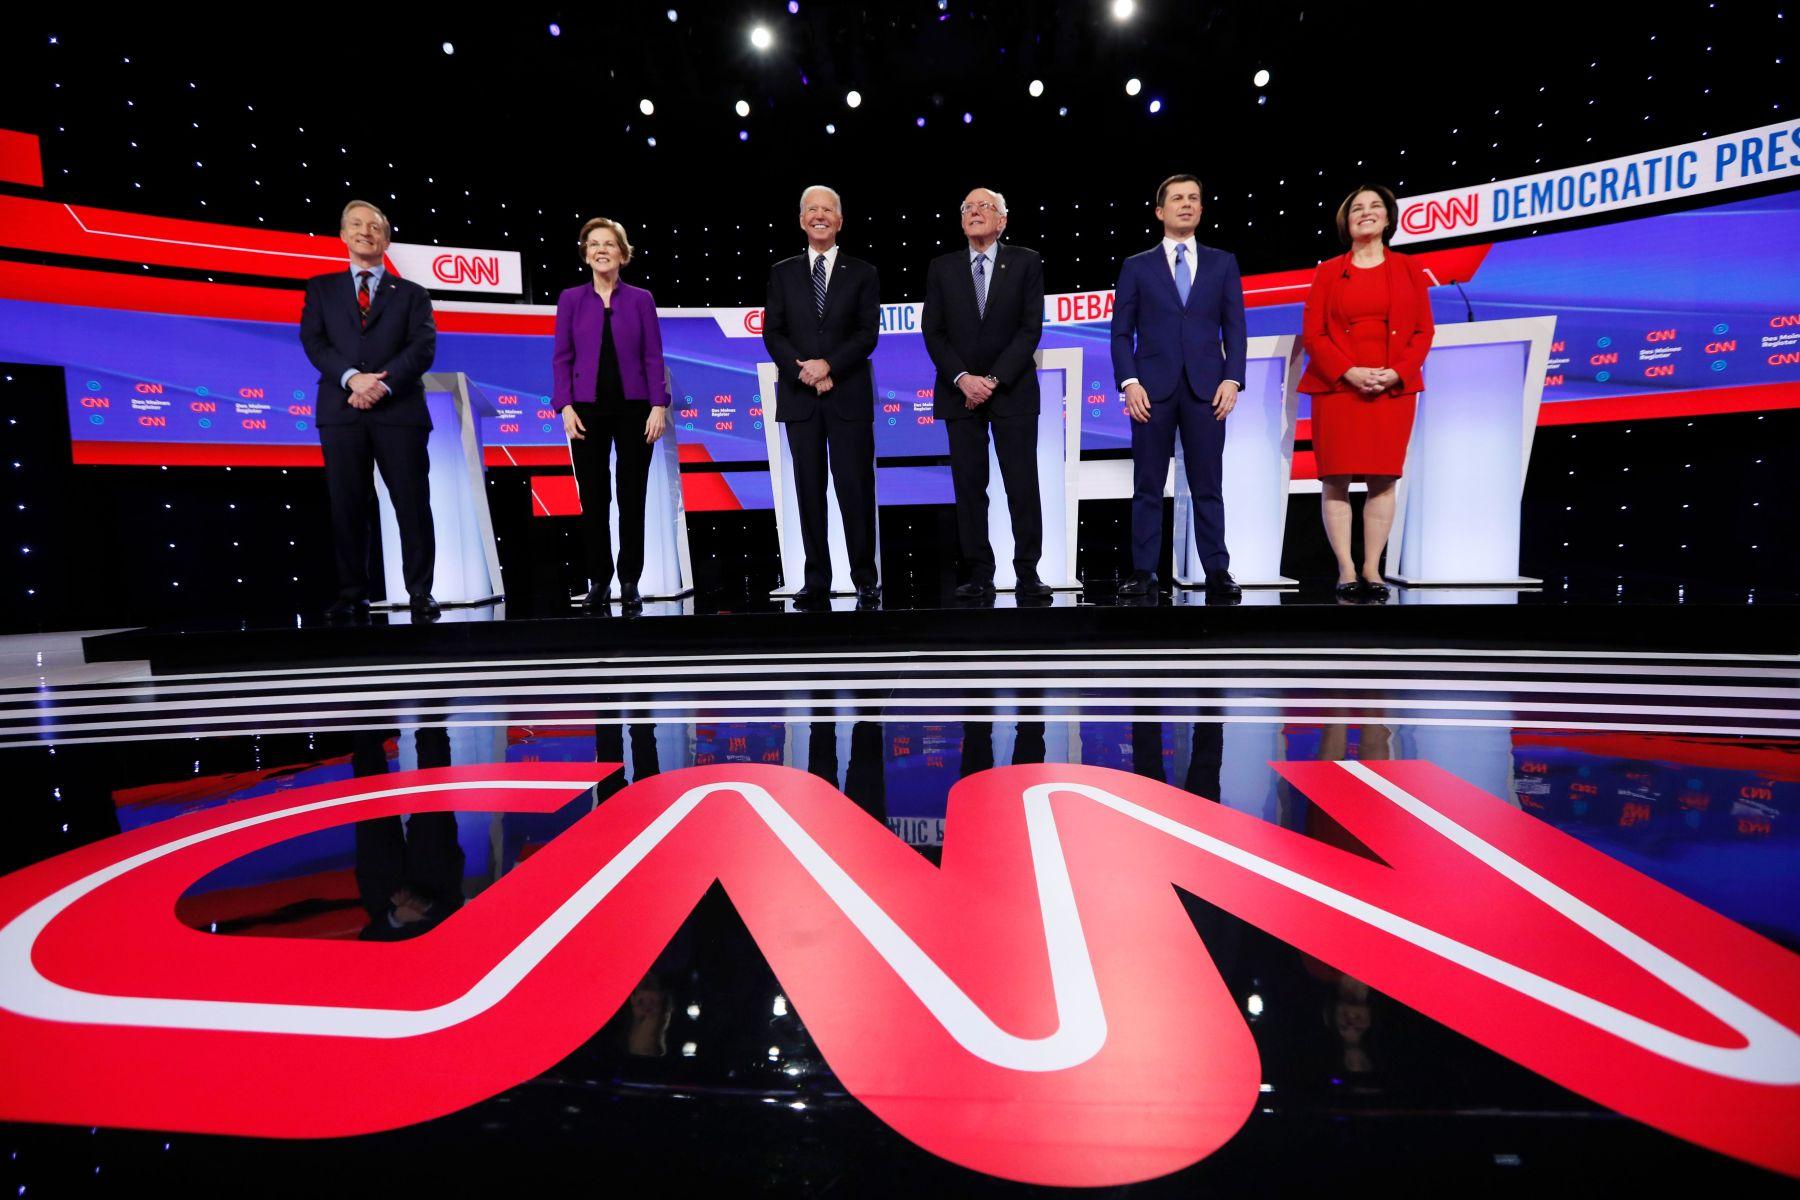 CNN's Democratic debate stage